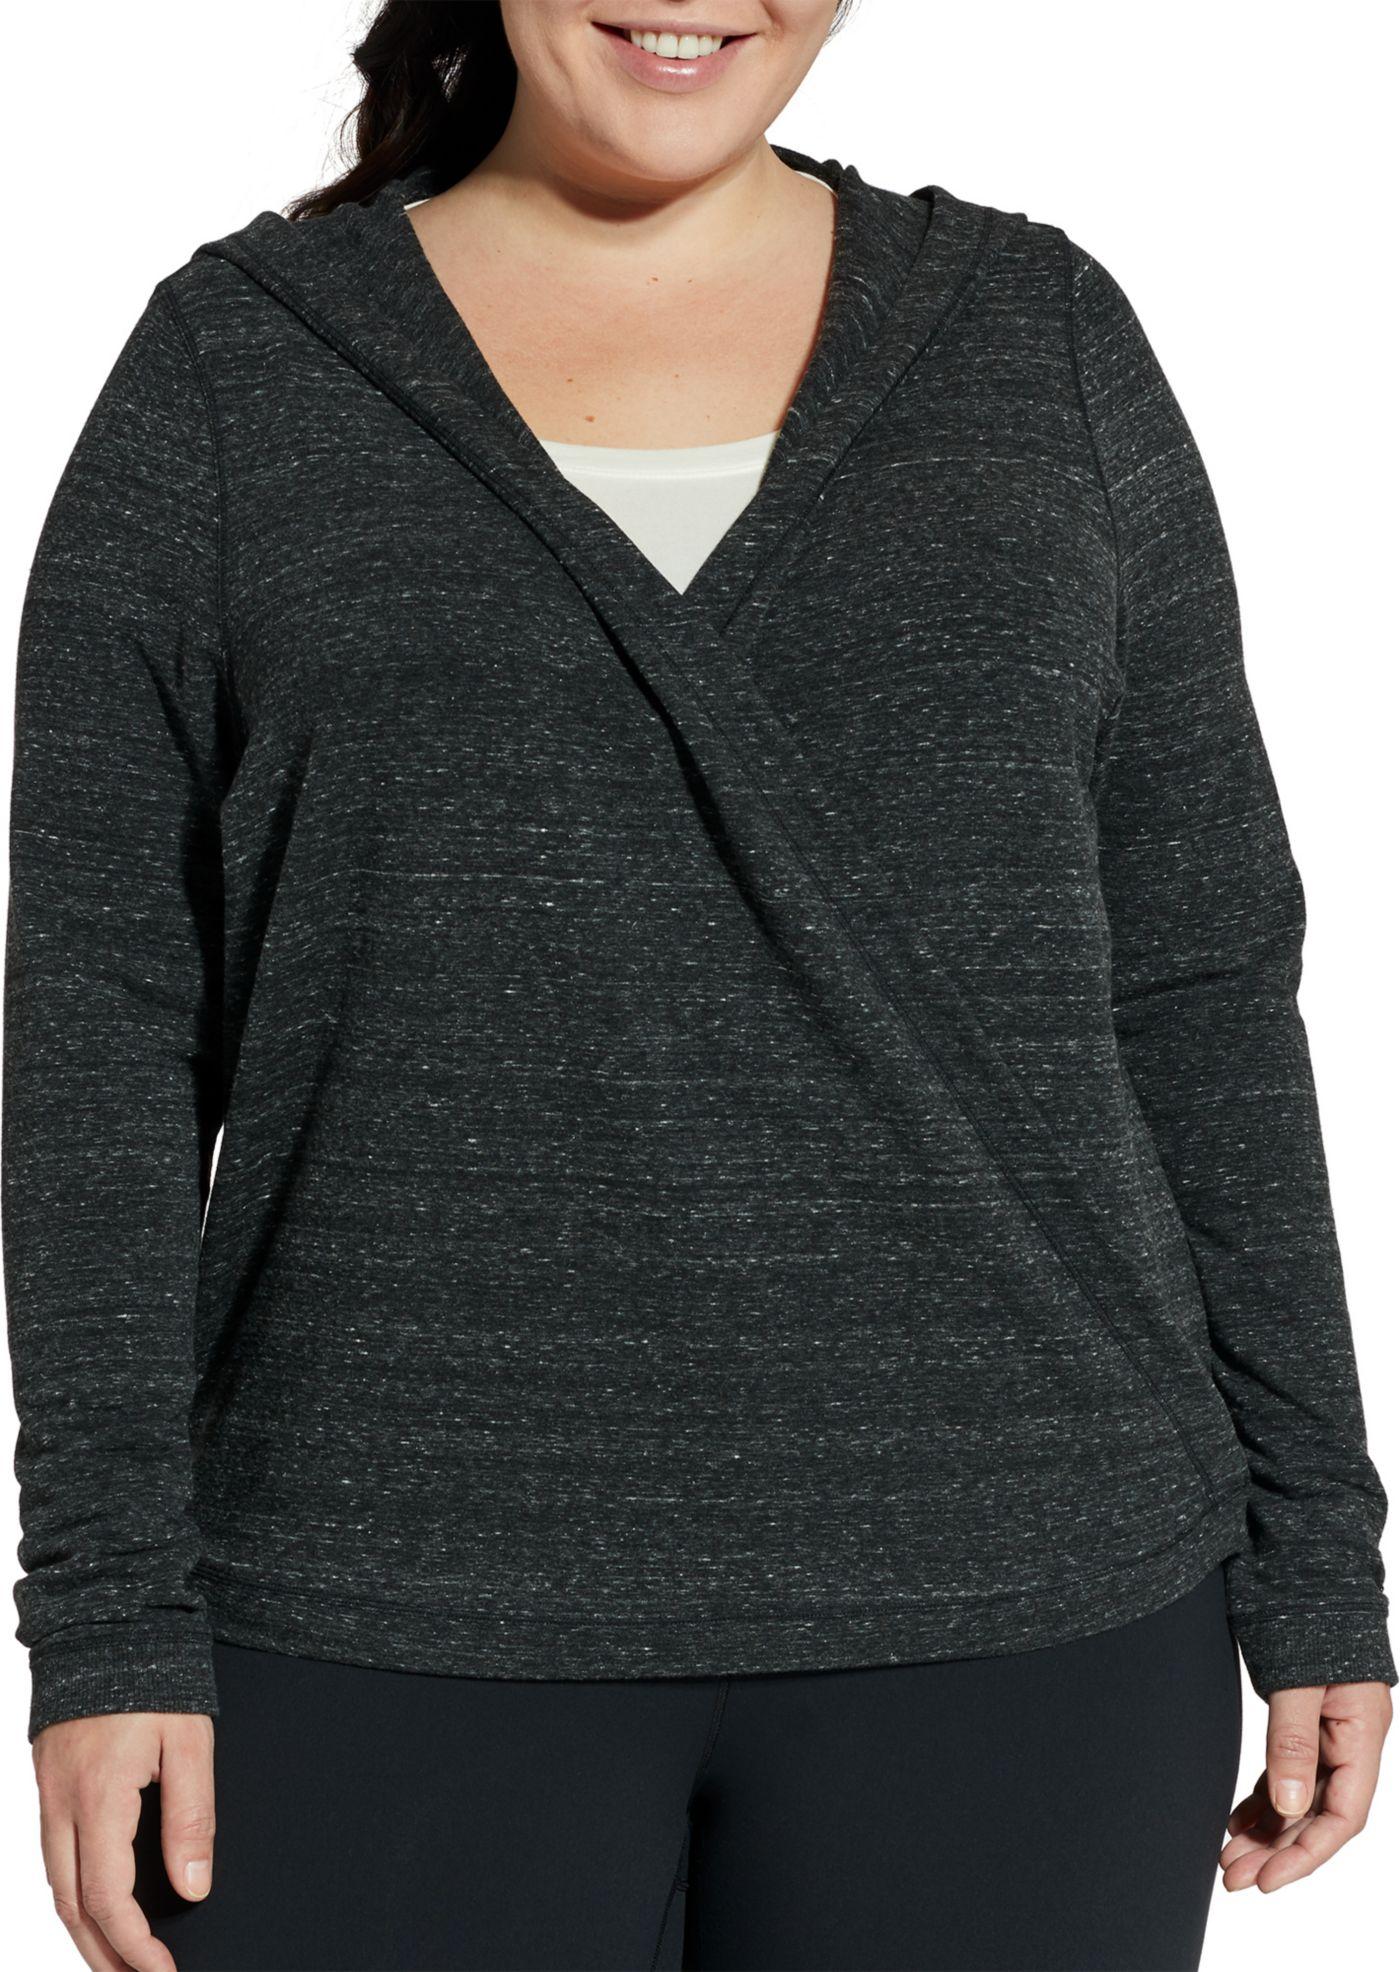 CALIA by Carrie Underwood Women's Plus Size Effortless Wrap Cardigan